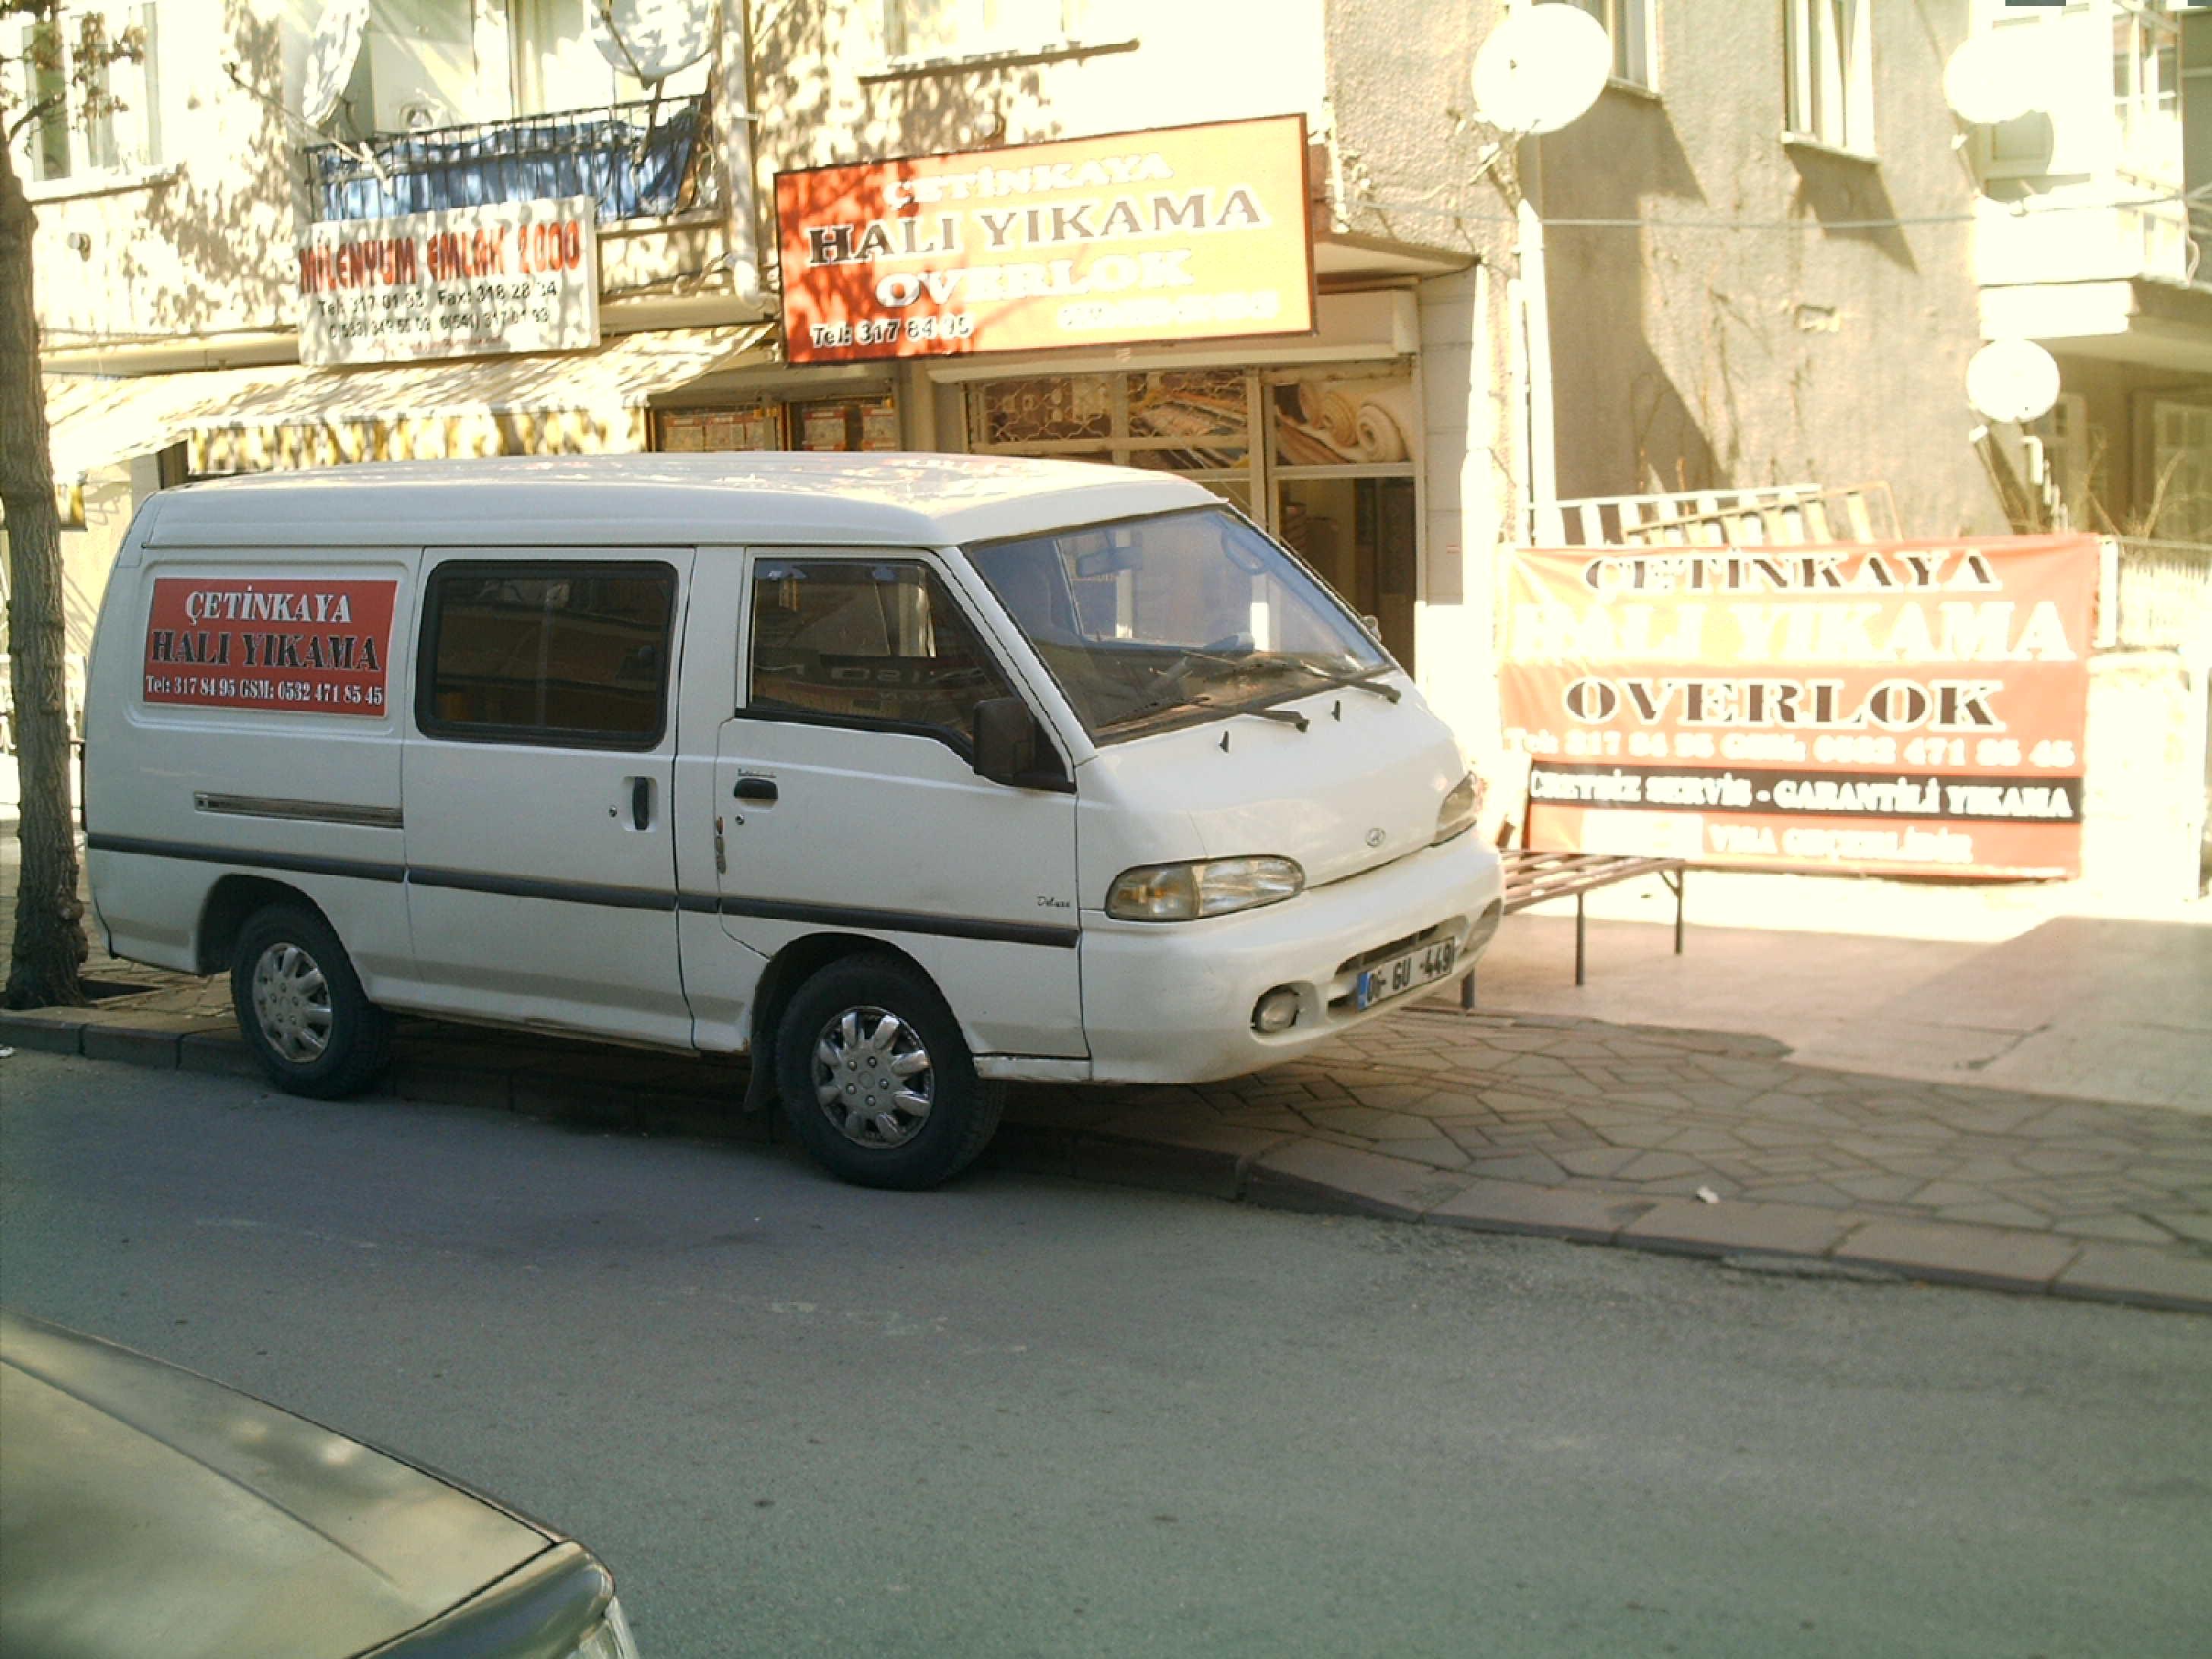 kuzey_ankara_yikama_servis-1 (1)